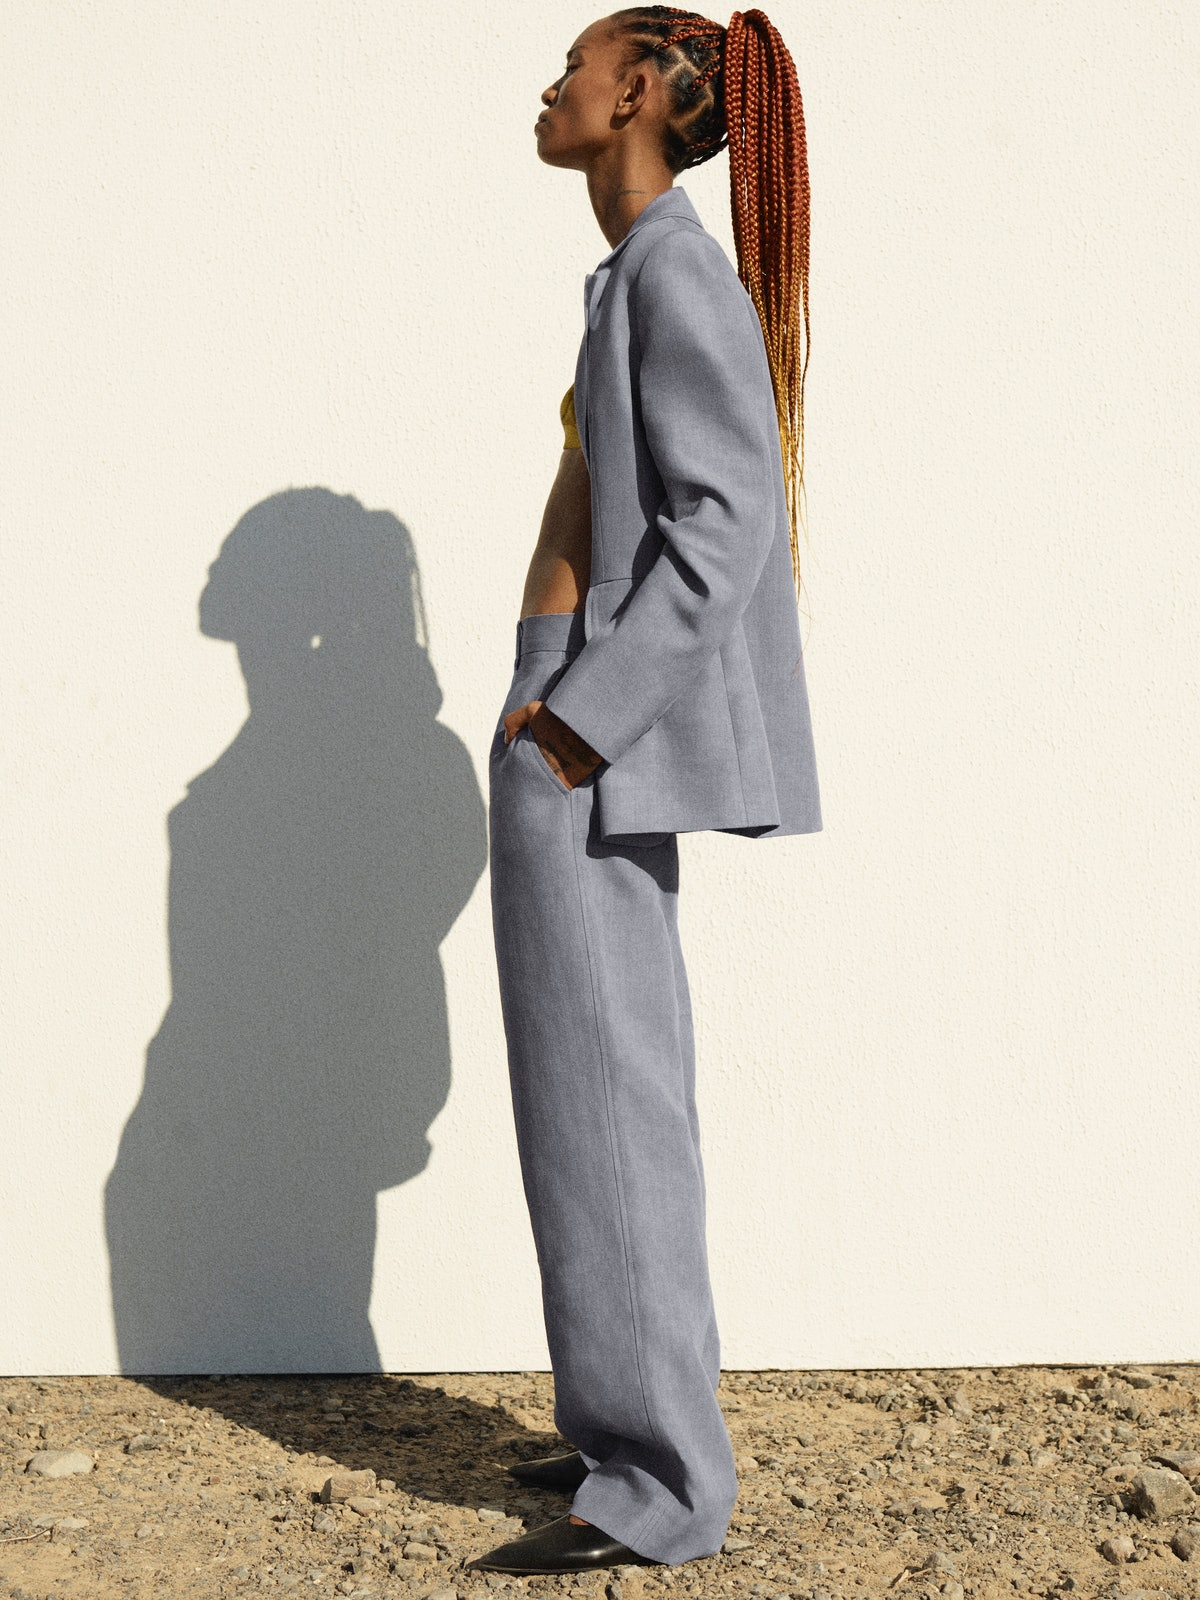 Adesuwa Aighewi in a COS campaign